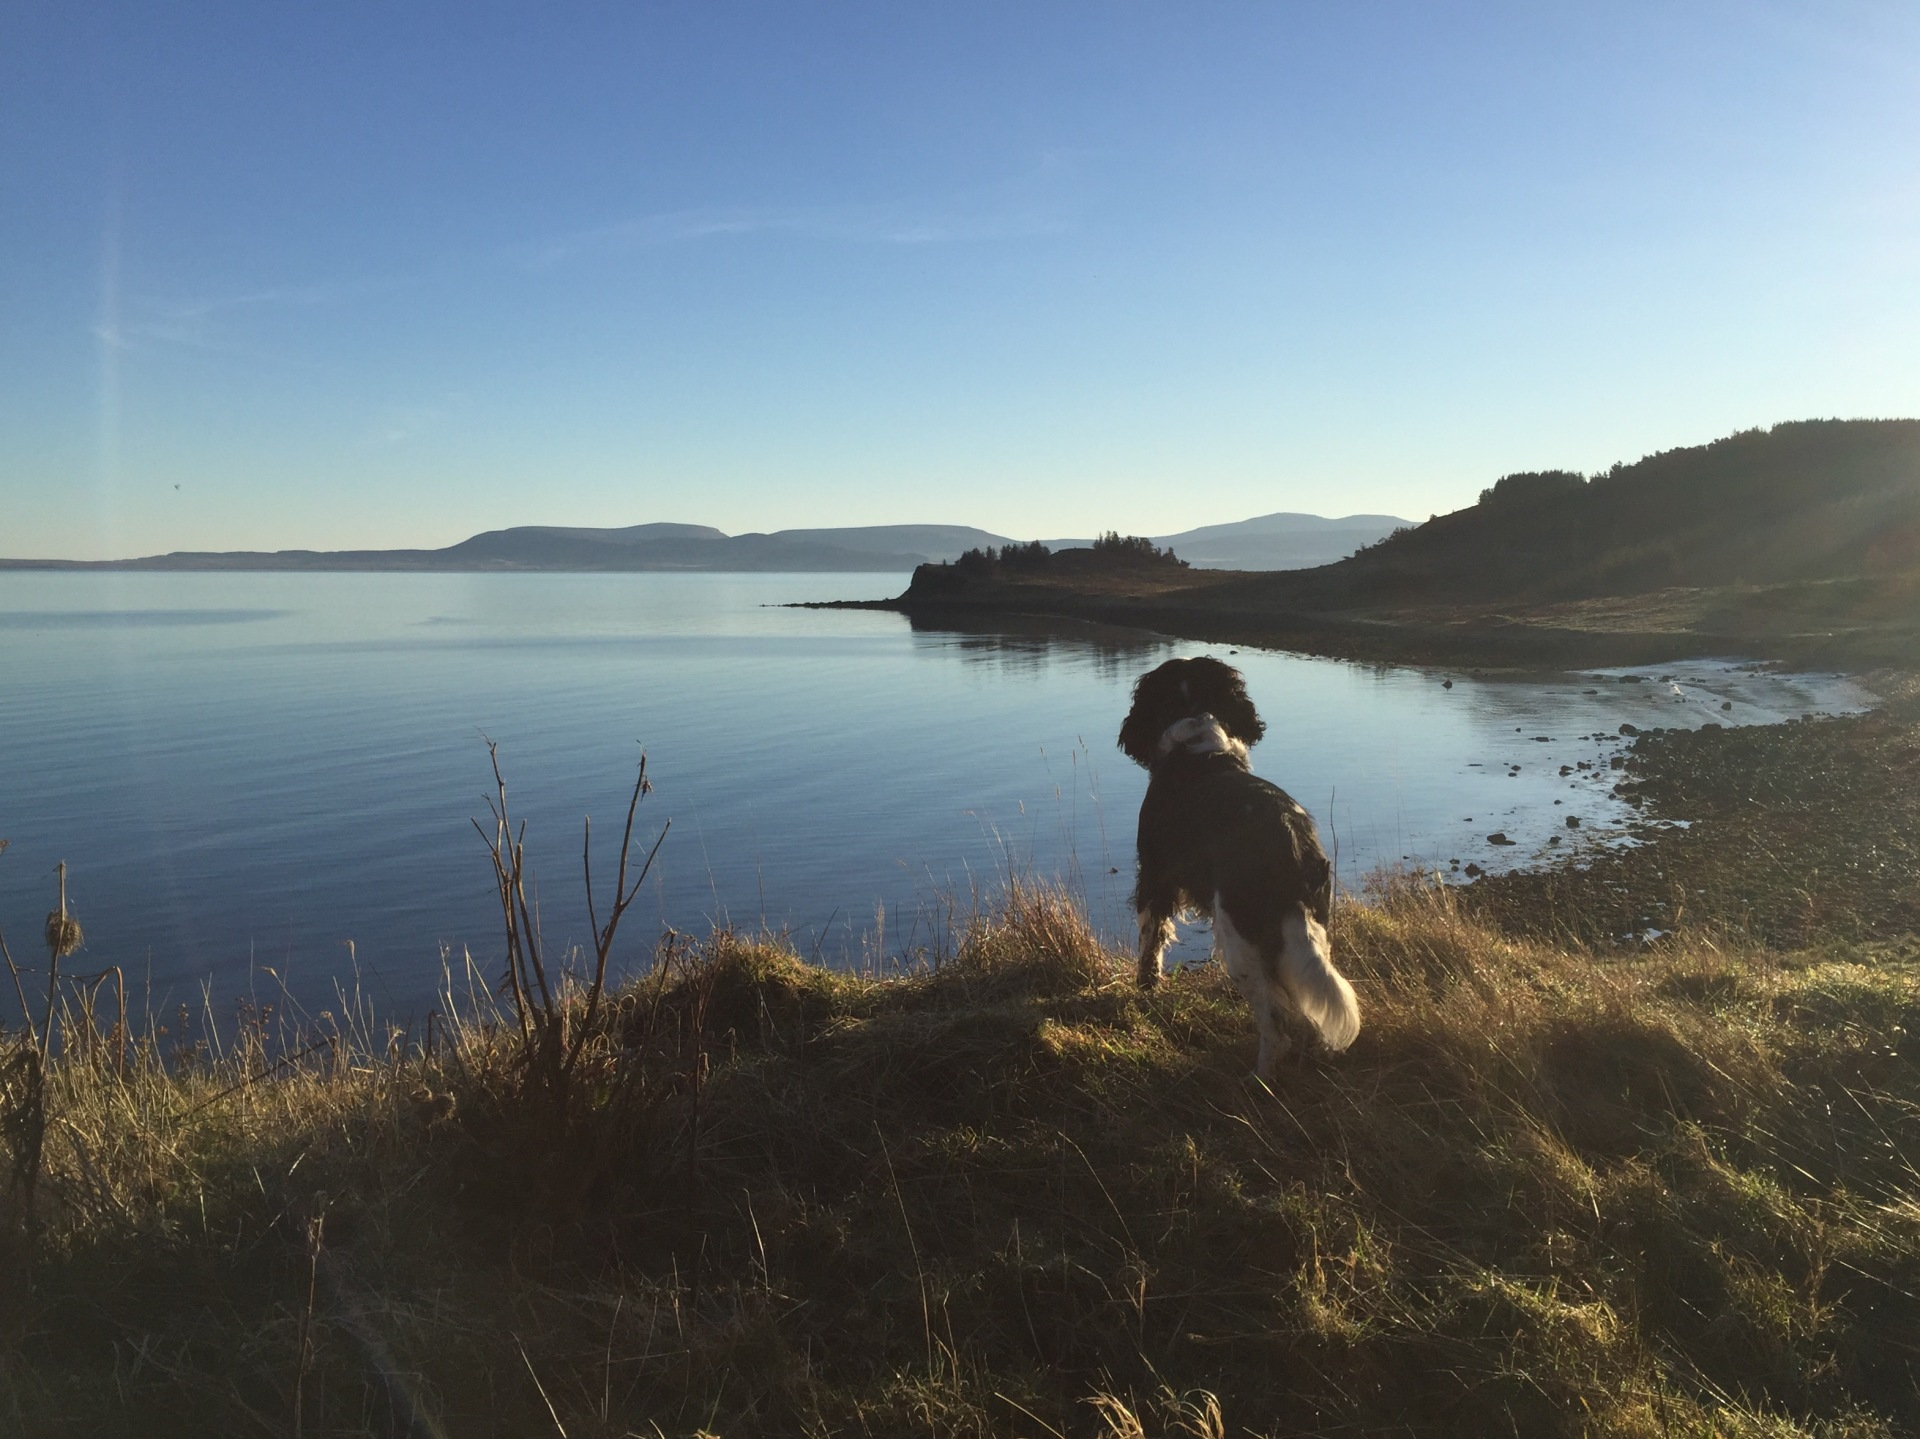 Rhumdog admiring the view over Score Bay